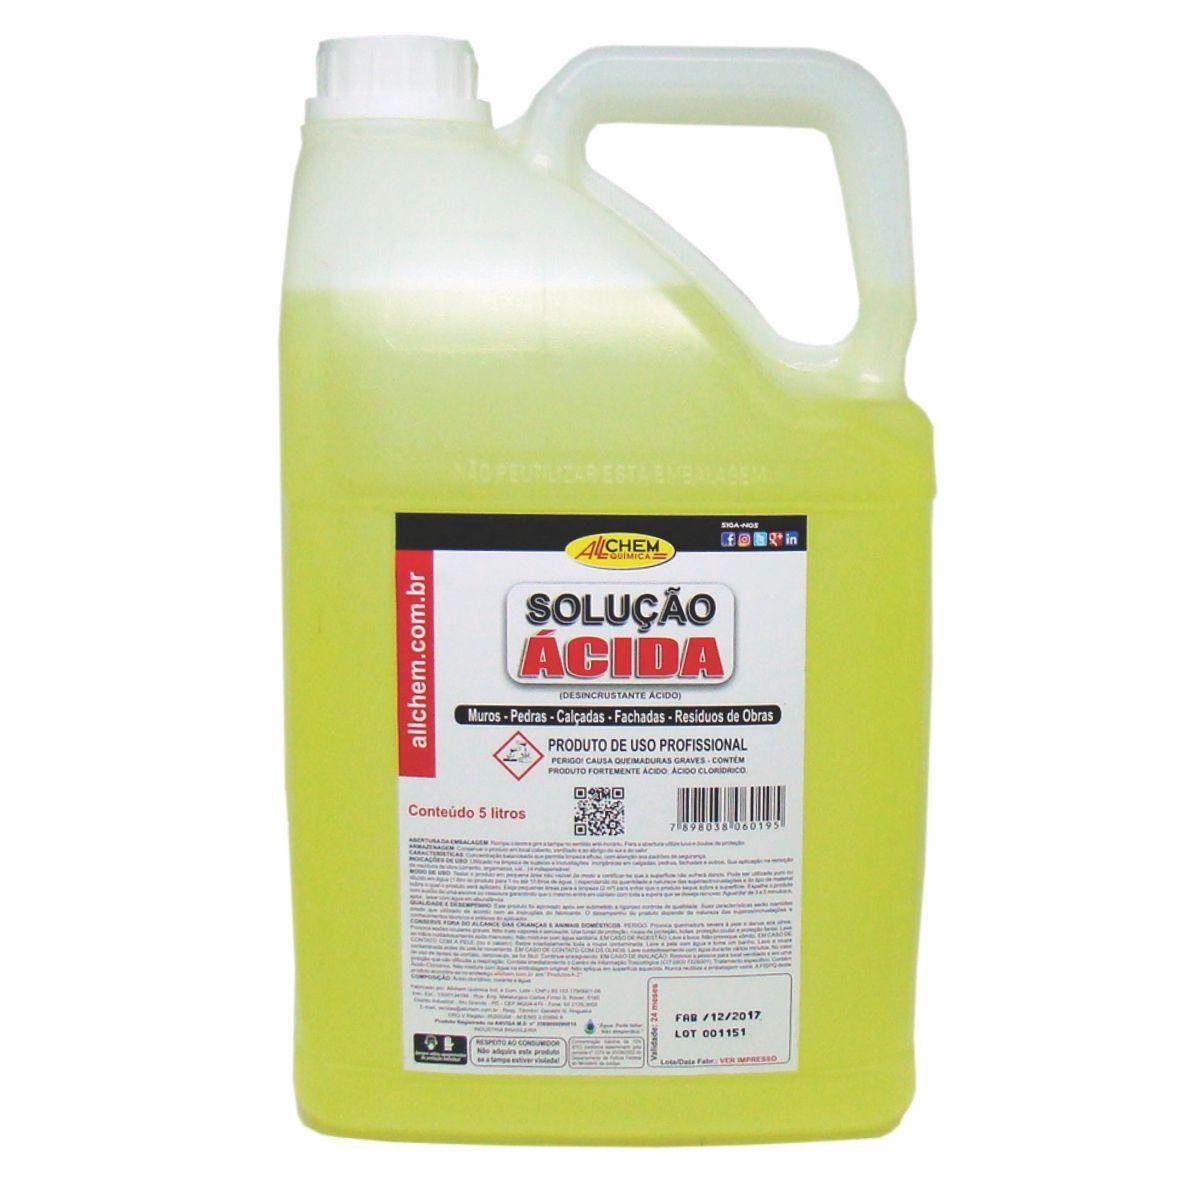 solucao-acida-allchem